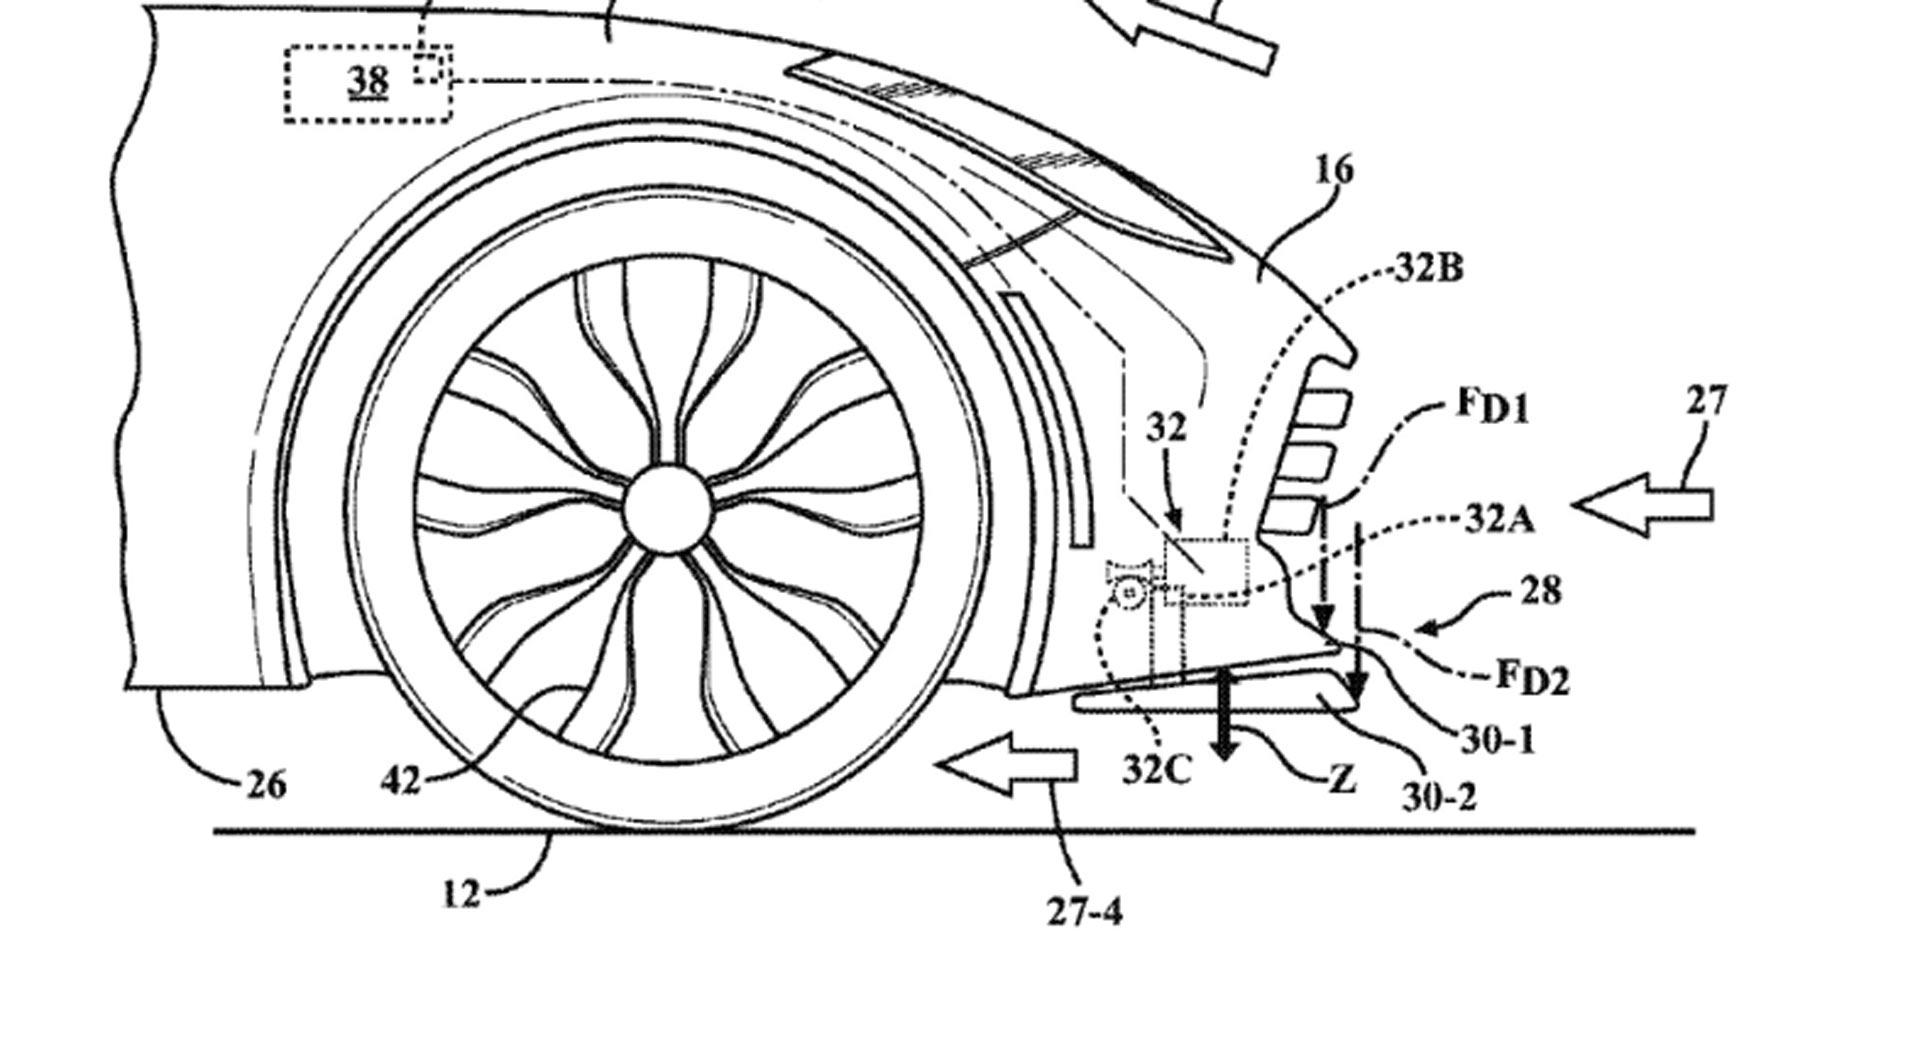 Mid Engine C8 Corvette Could Get Trick Active Aero System